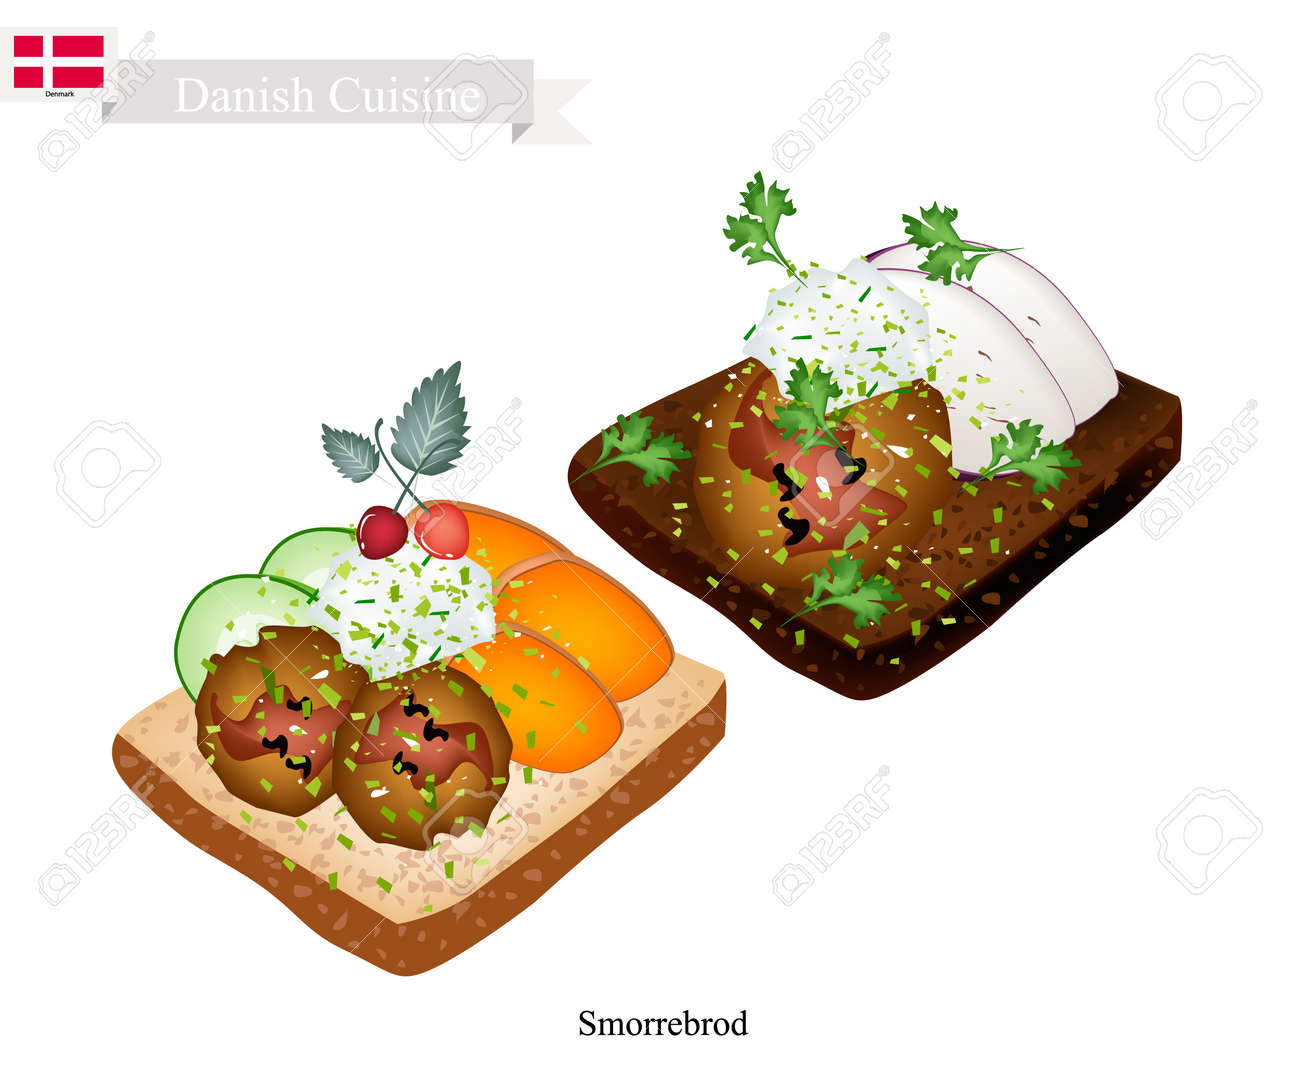 Cuisine Illustration danish cuisine, illustration of smorrebrod or traditional buttered